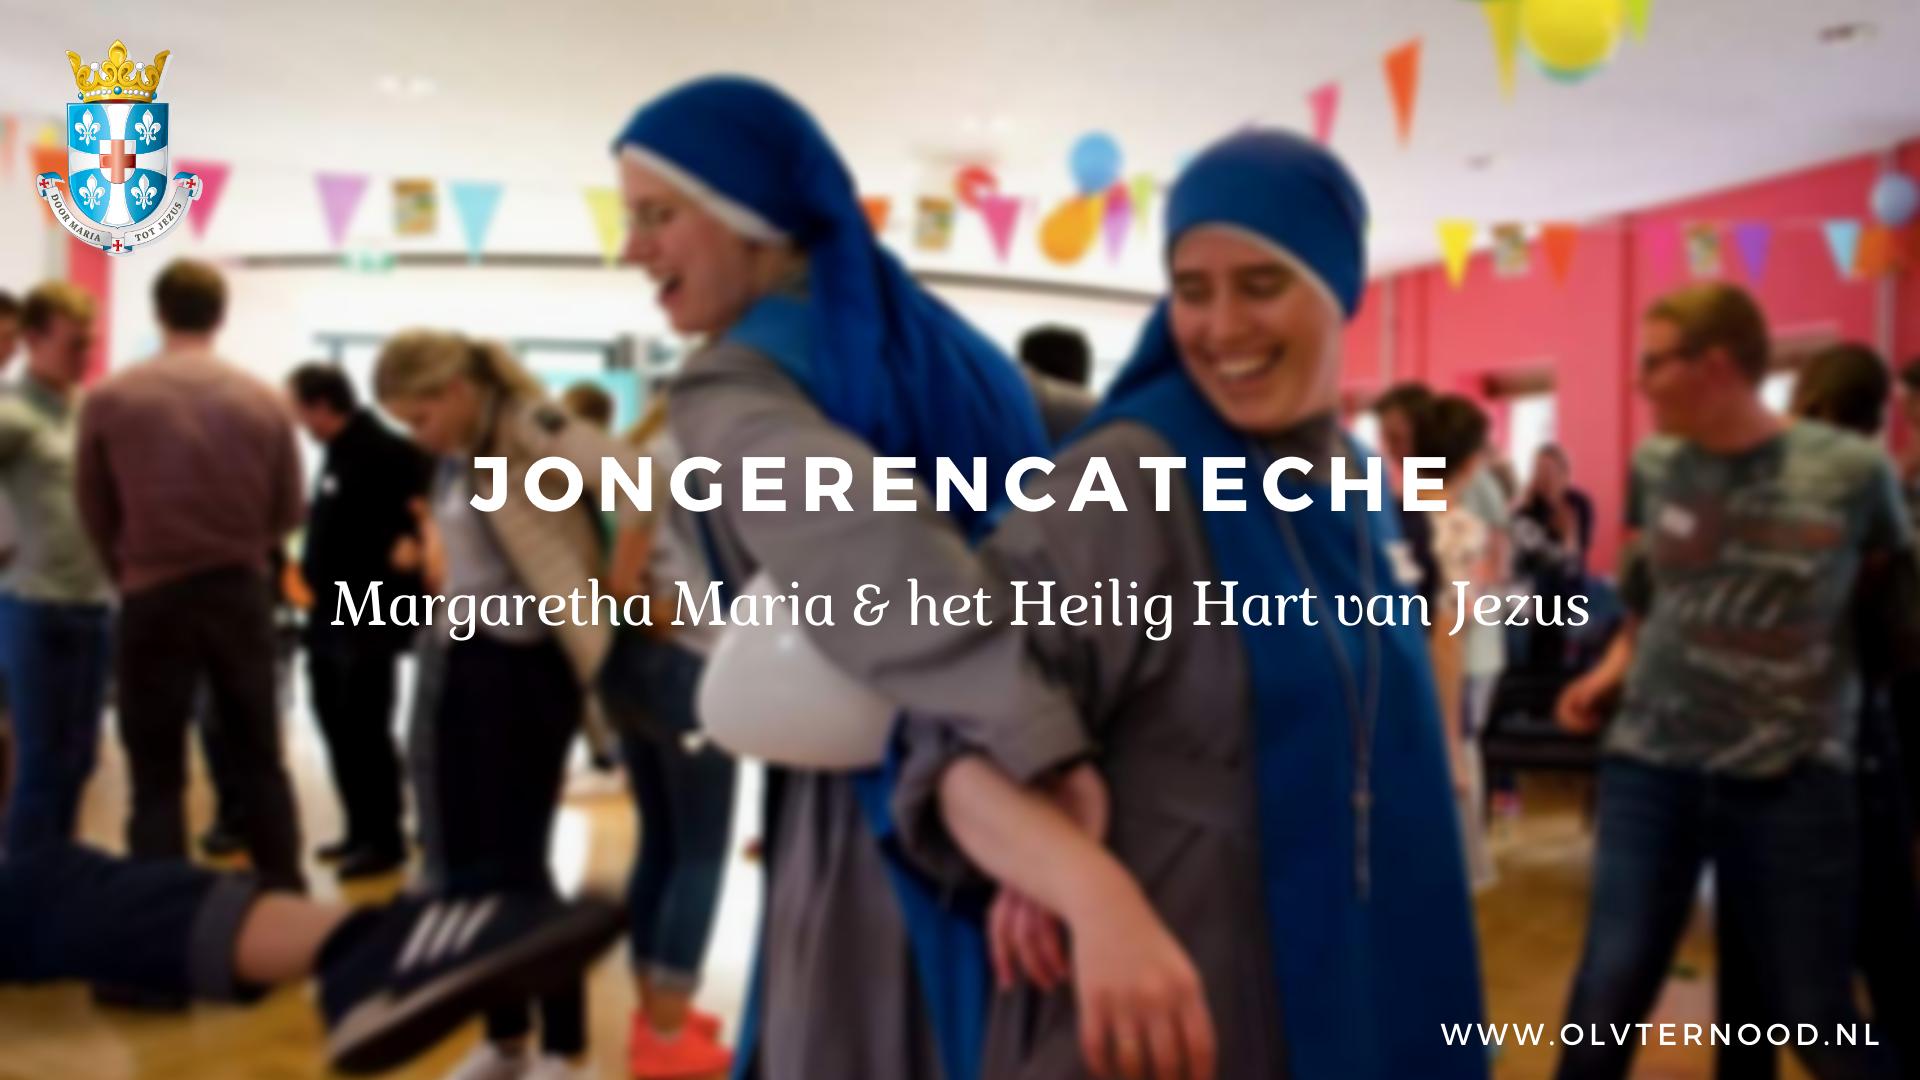 catechese-olv-ter-nood-jongeren-heilig-hart-jezus